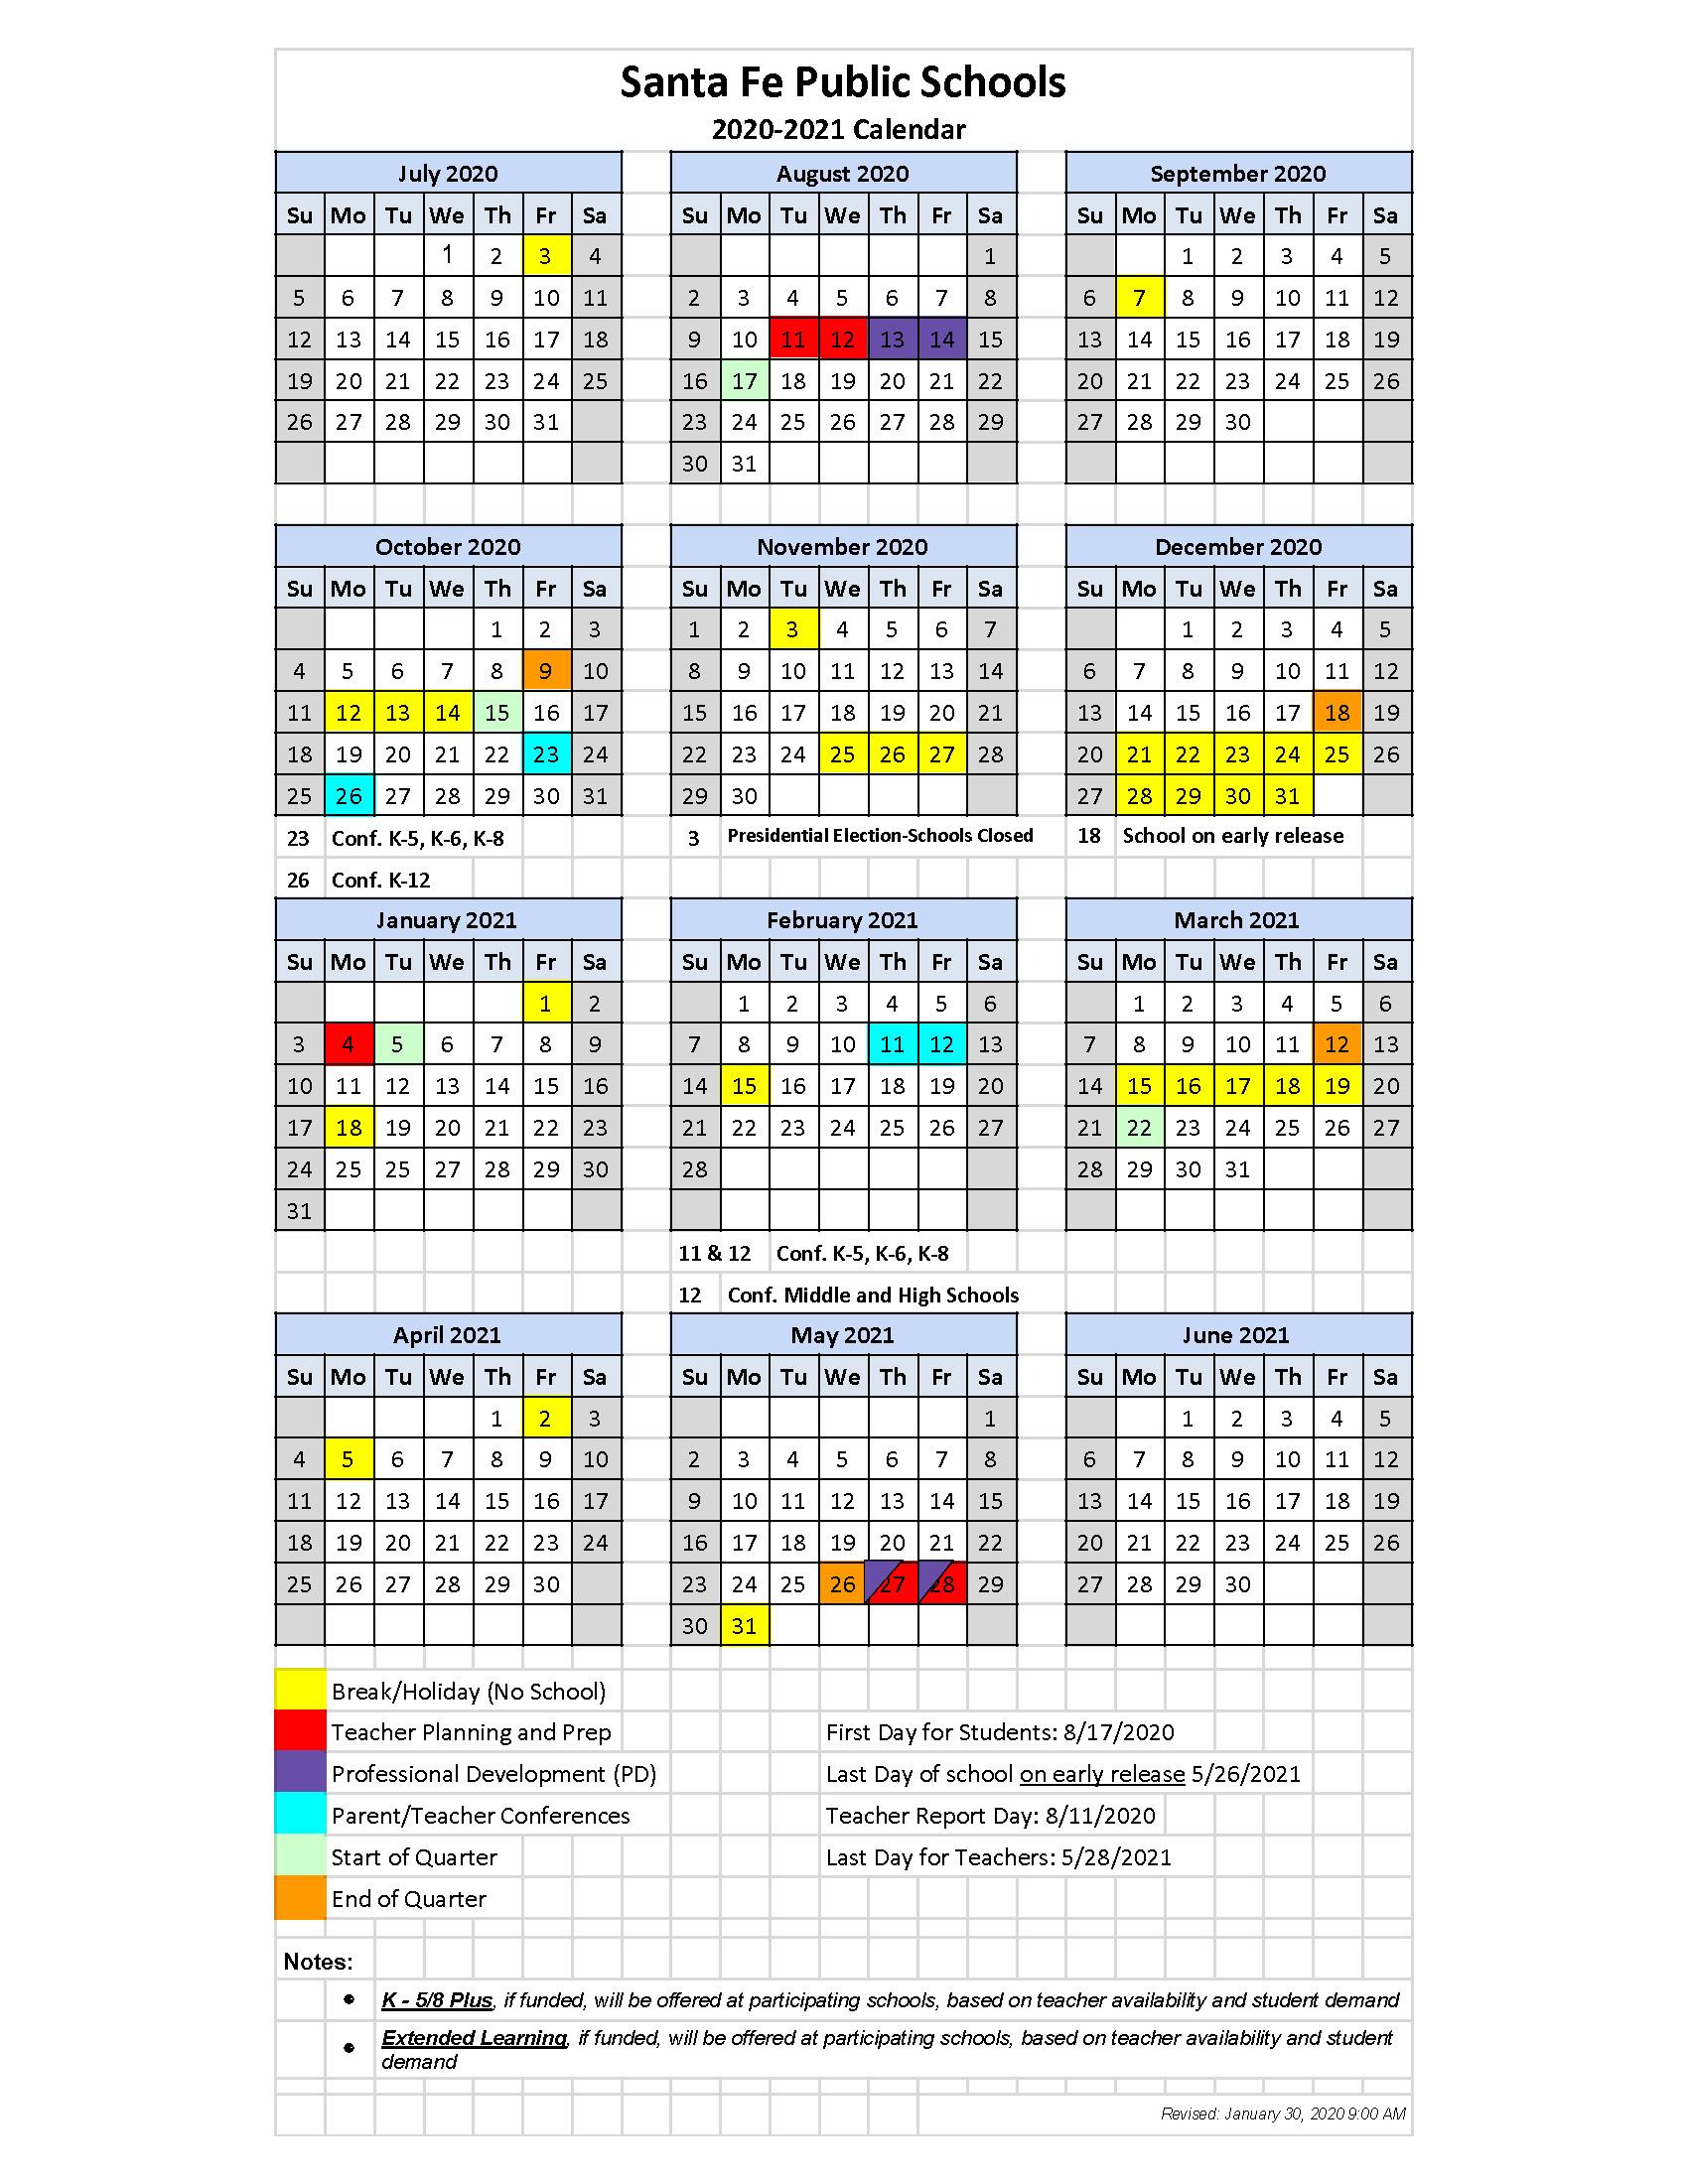 01-30-2020 Sy 2020-21 Calendar - Santa Fe Public Schools inside Santa Fe Public Schools Calendar